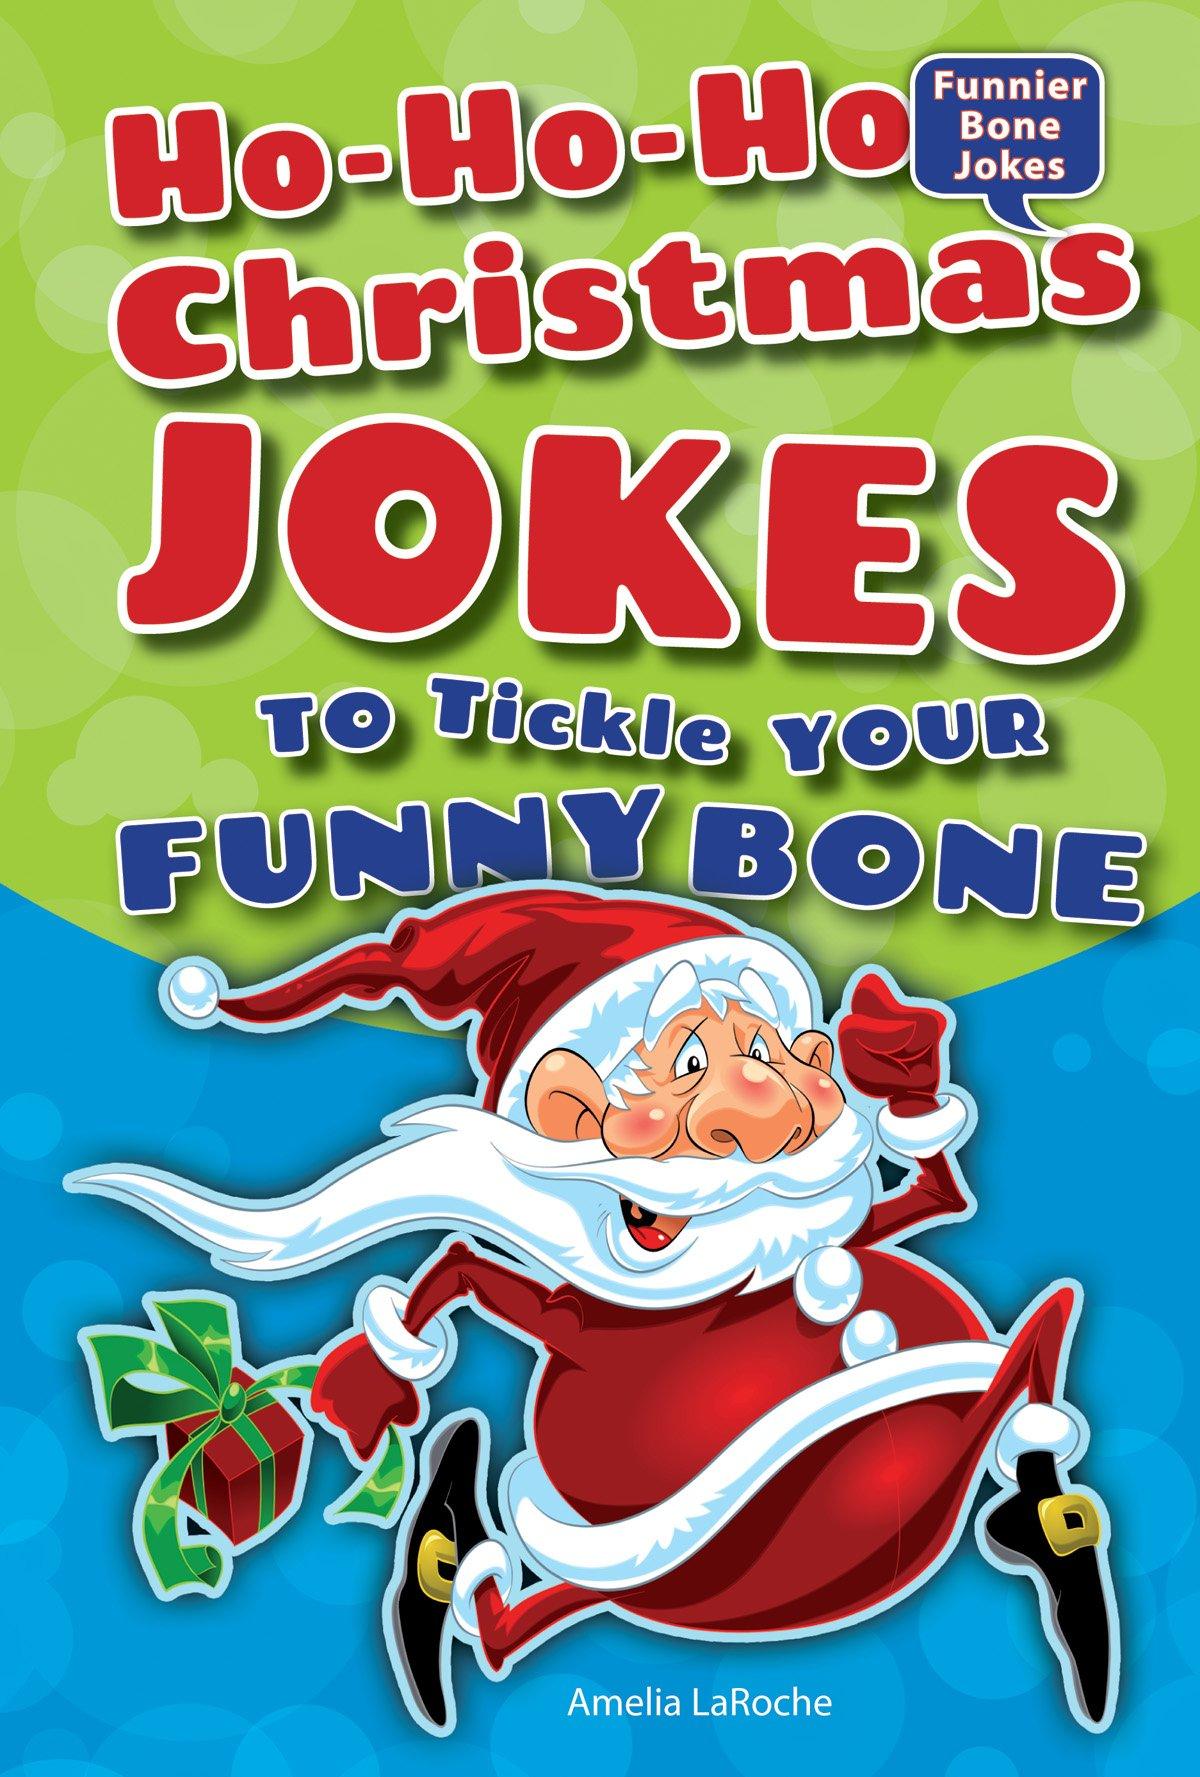 Ho-Ho-Ho Christmas Jokes to Tickle Your Funny Bone (Funnier Bone Jokes) pdf